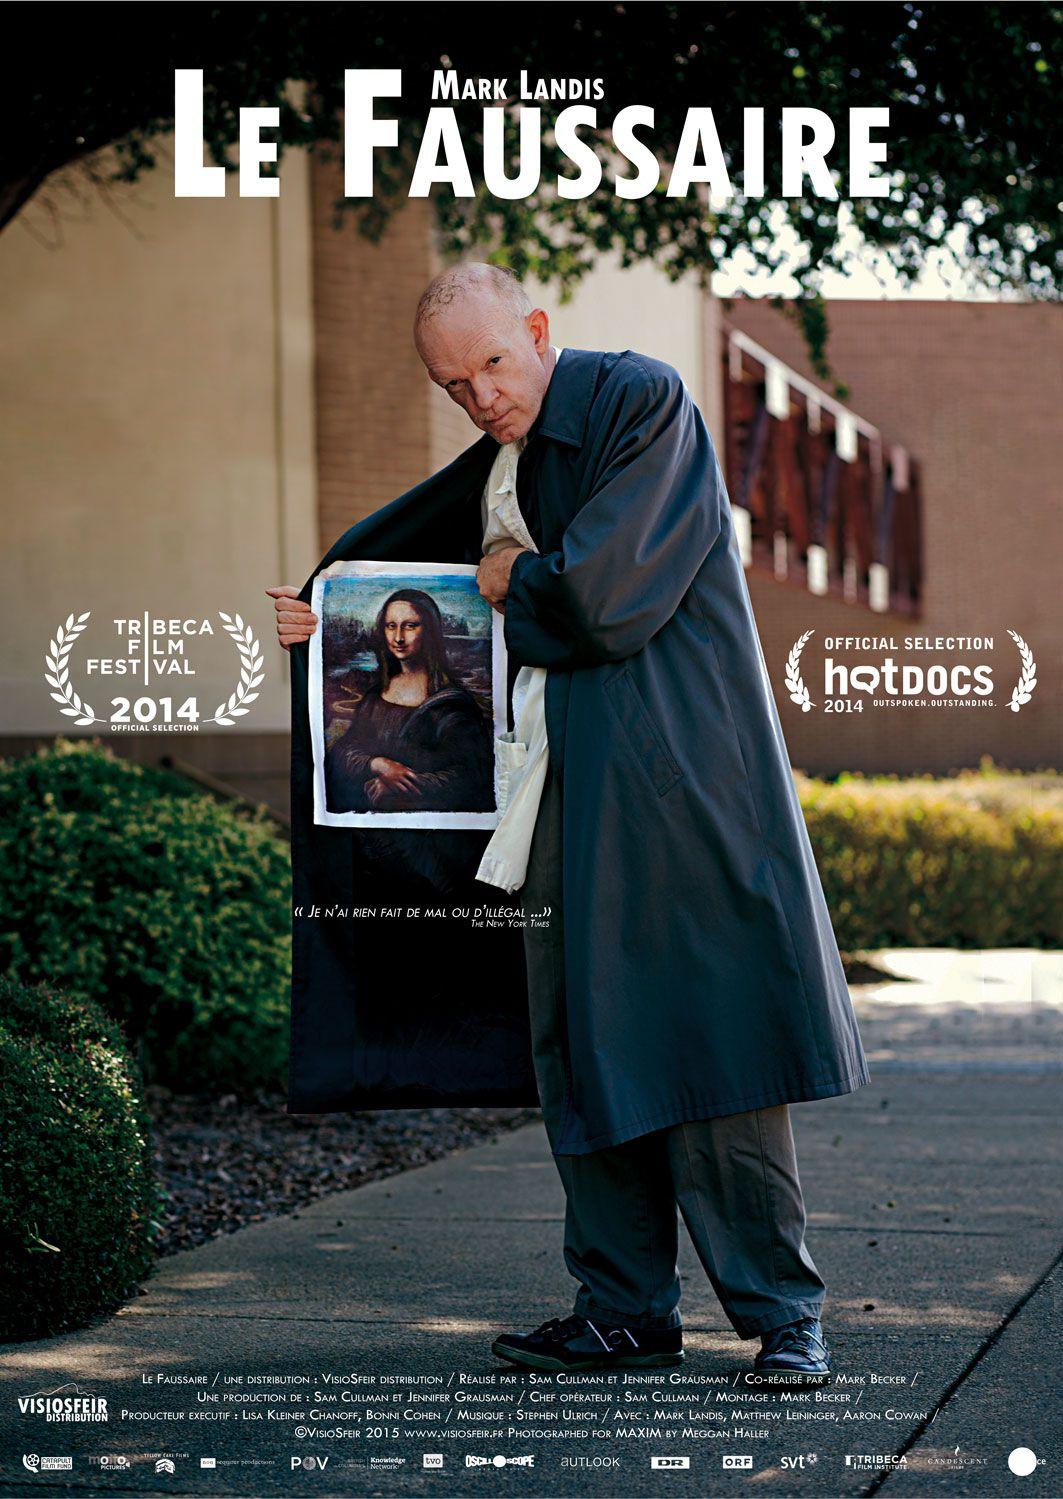 Le Faussaire - Documentaire (2015)